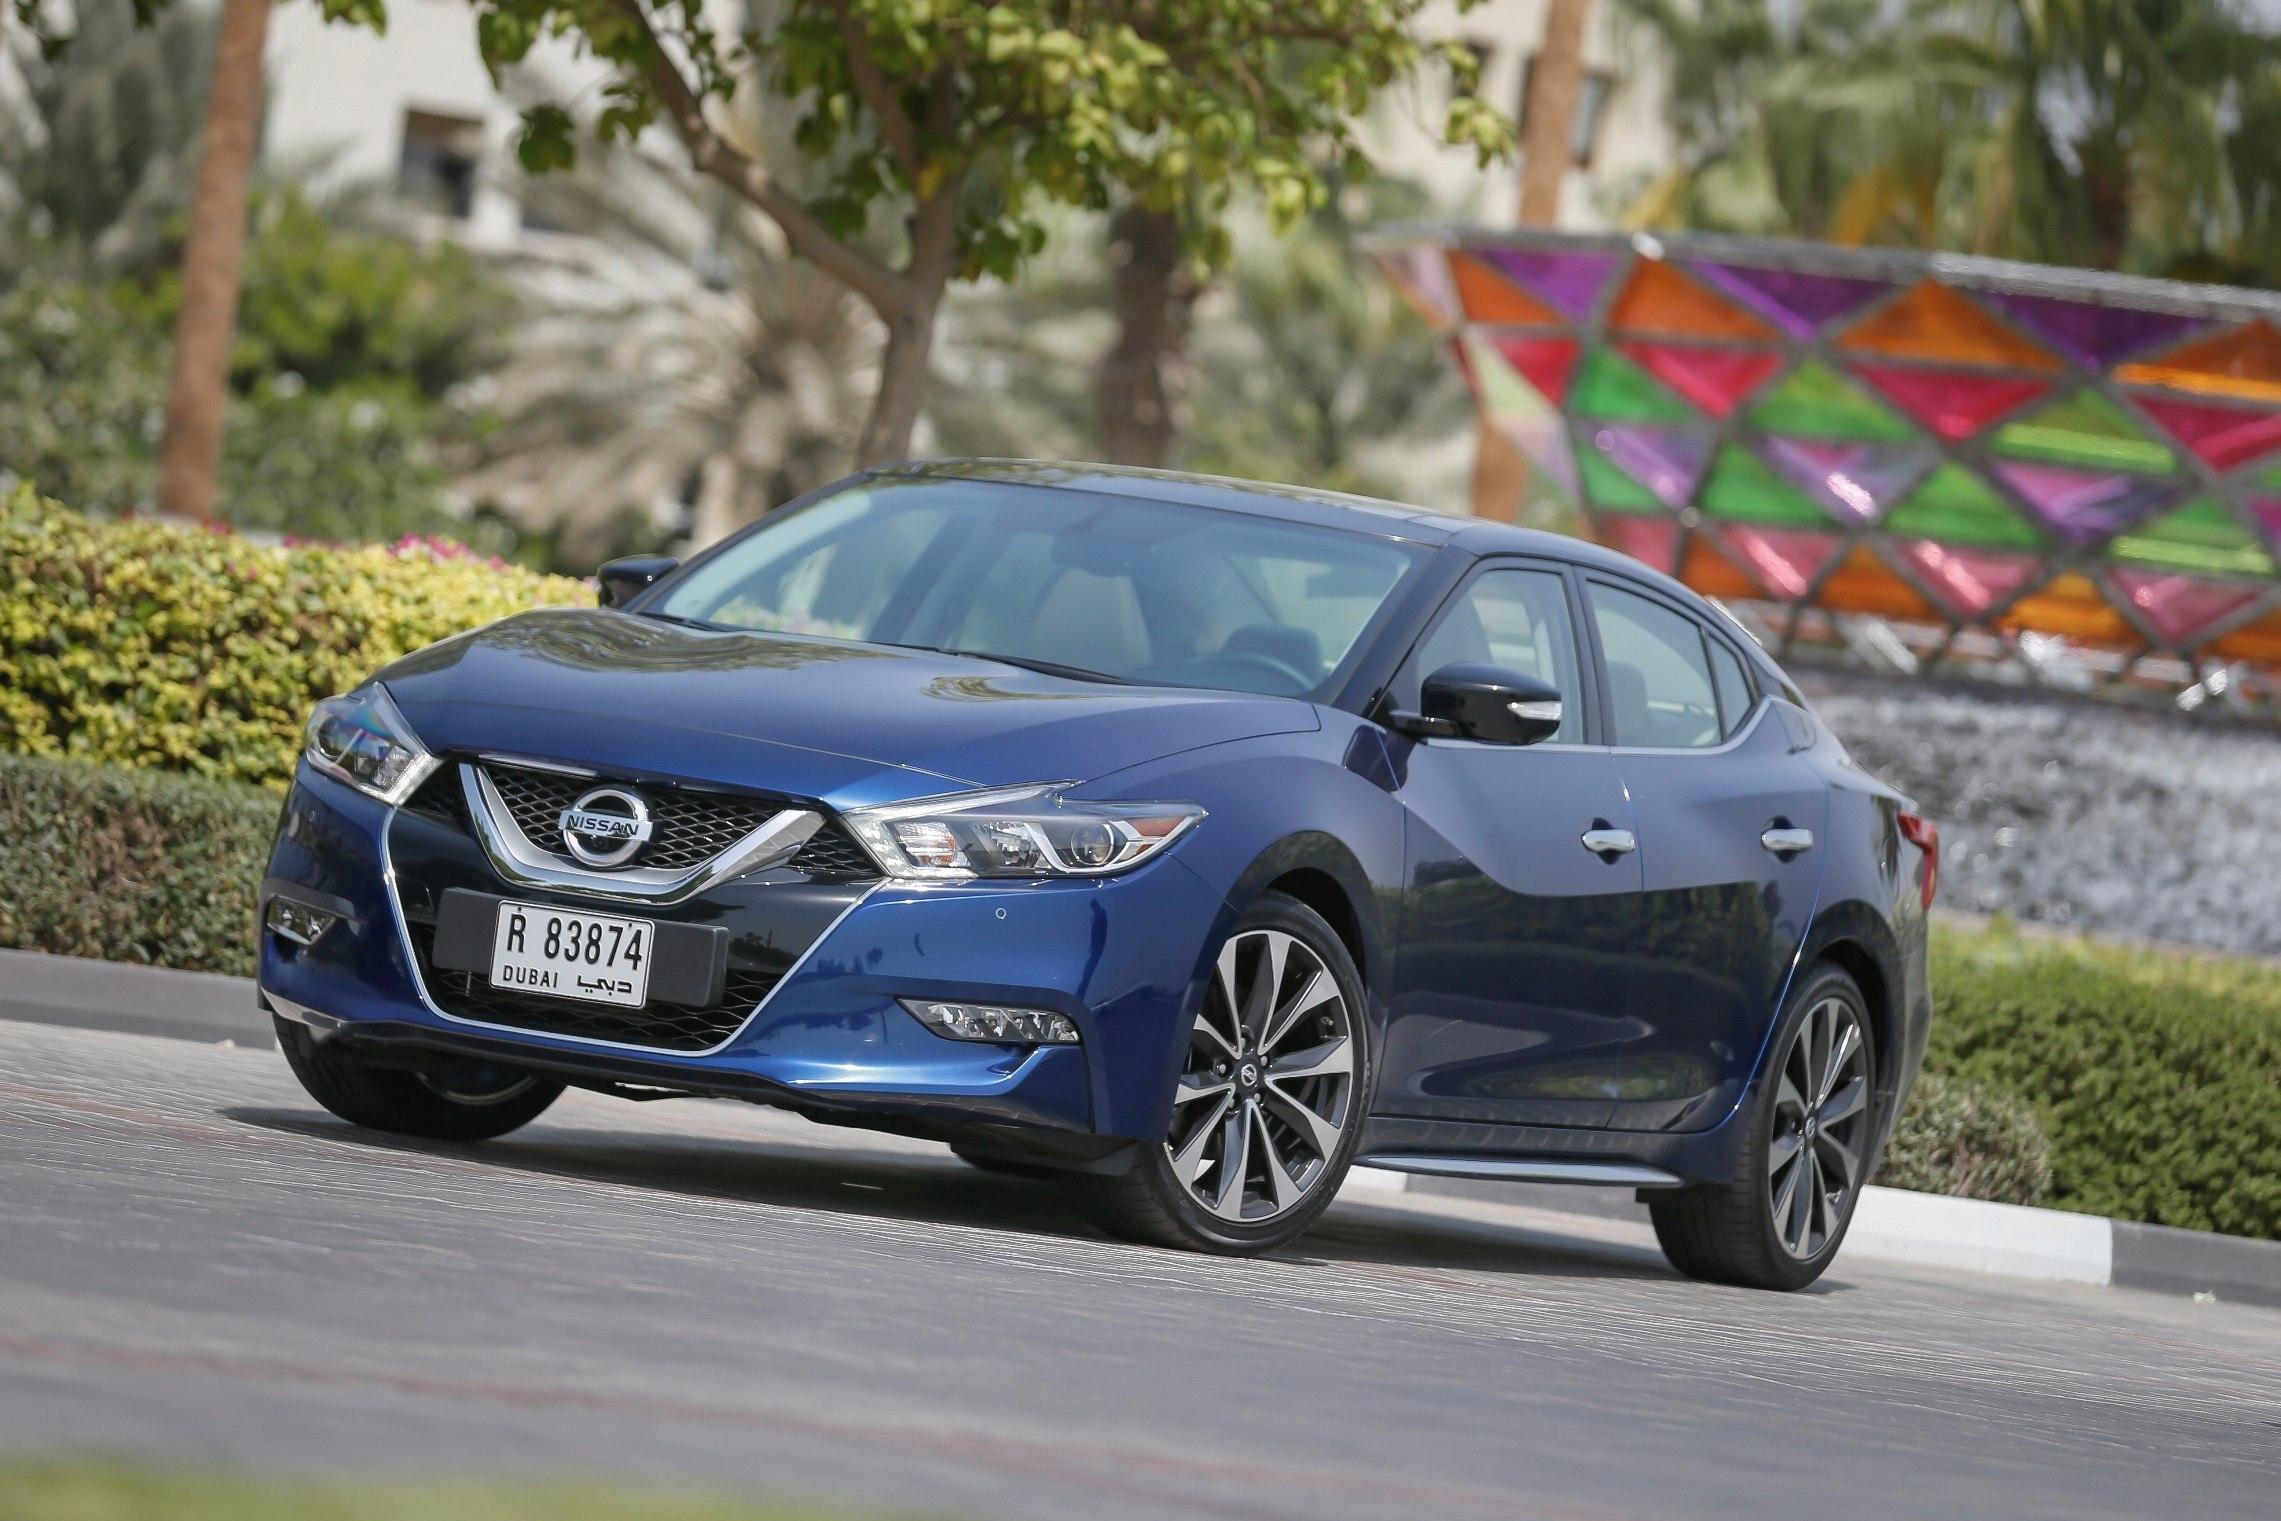 All-New Nissan Maxima 2016 Set To Reinvent Segment - Blue (1)